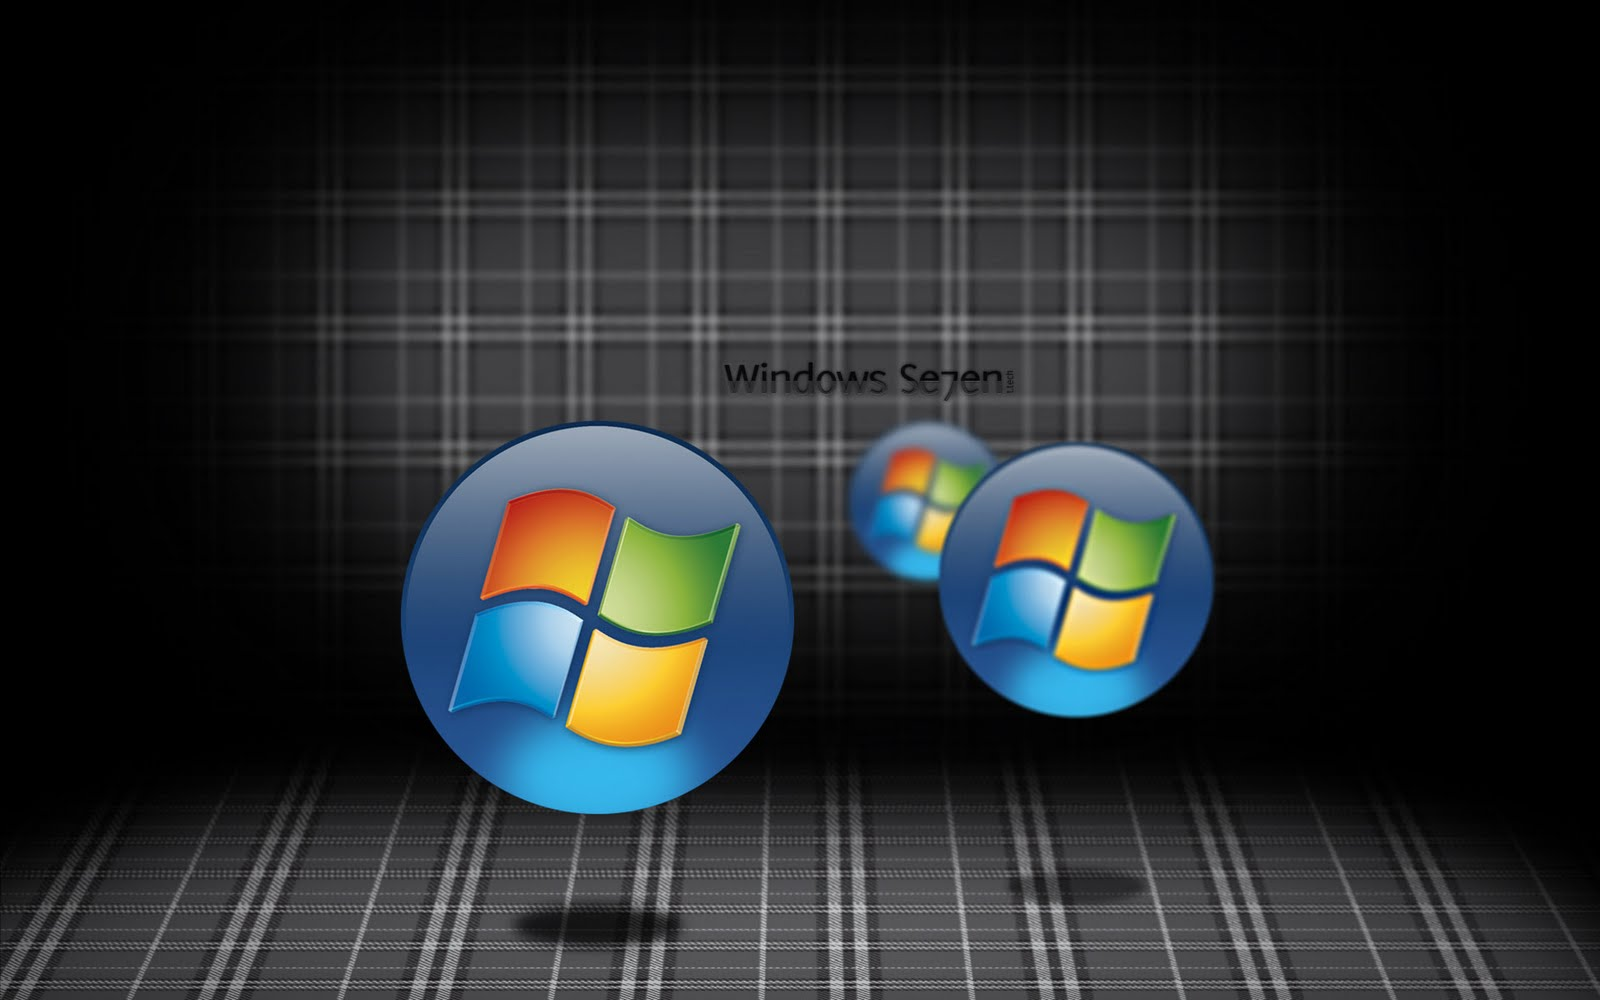 3d Wallpapers Download For Windows Xp Funtoosh Mac Window 7 Desktop Hd Wallpapers